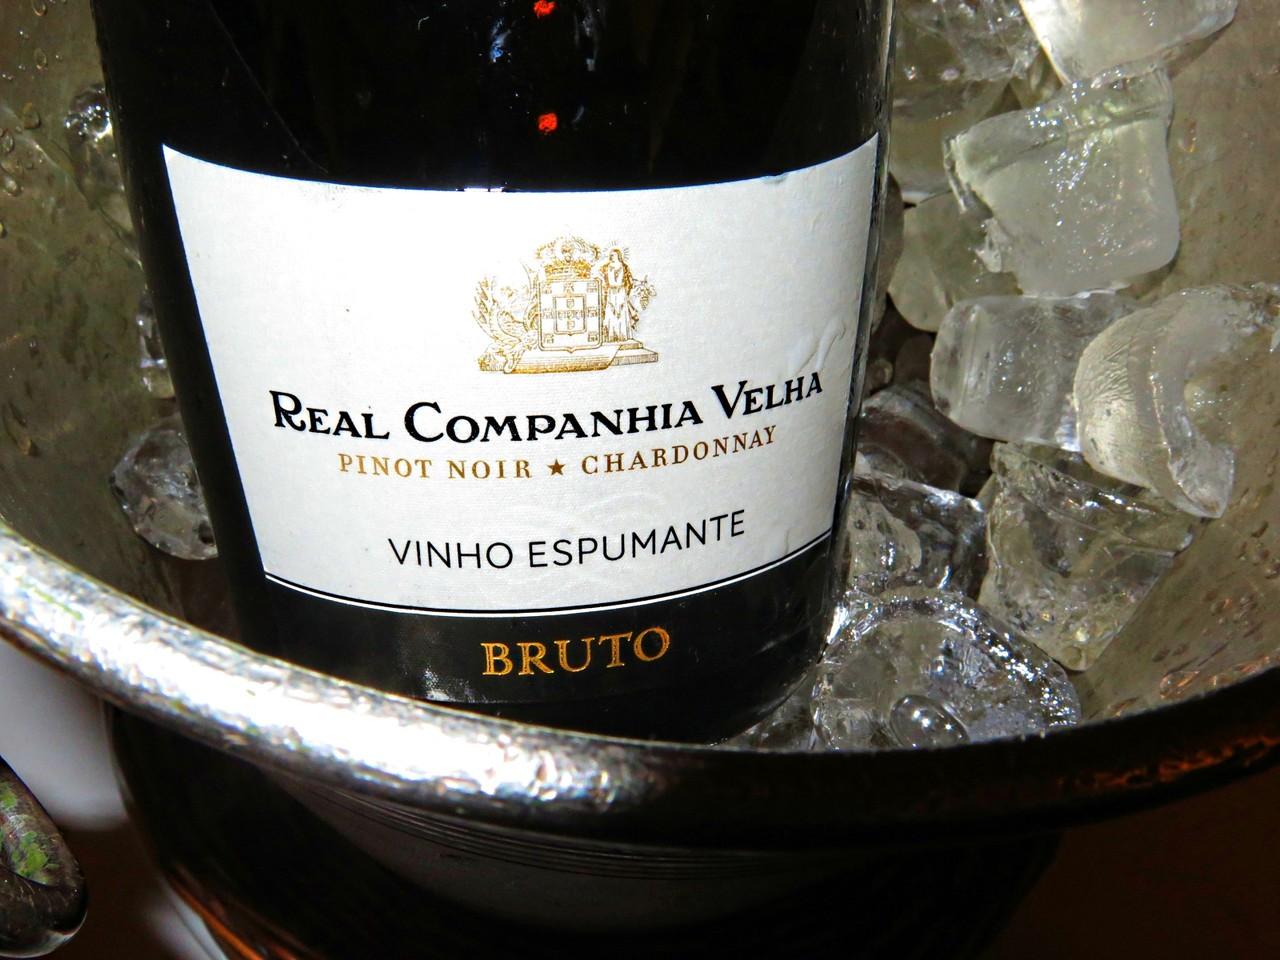 Real Companhia Velha Espumante Chardonnay & Pinot Noir Bruto 2013